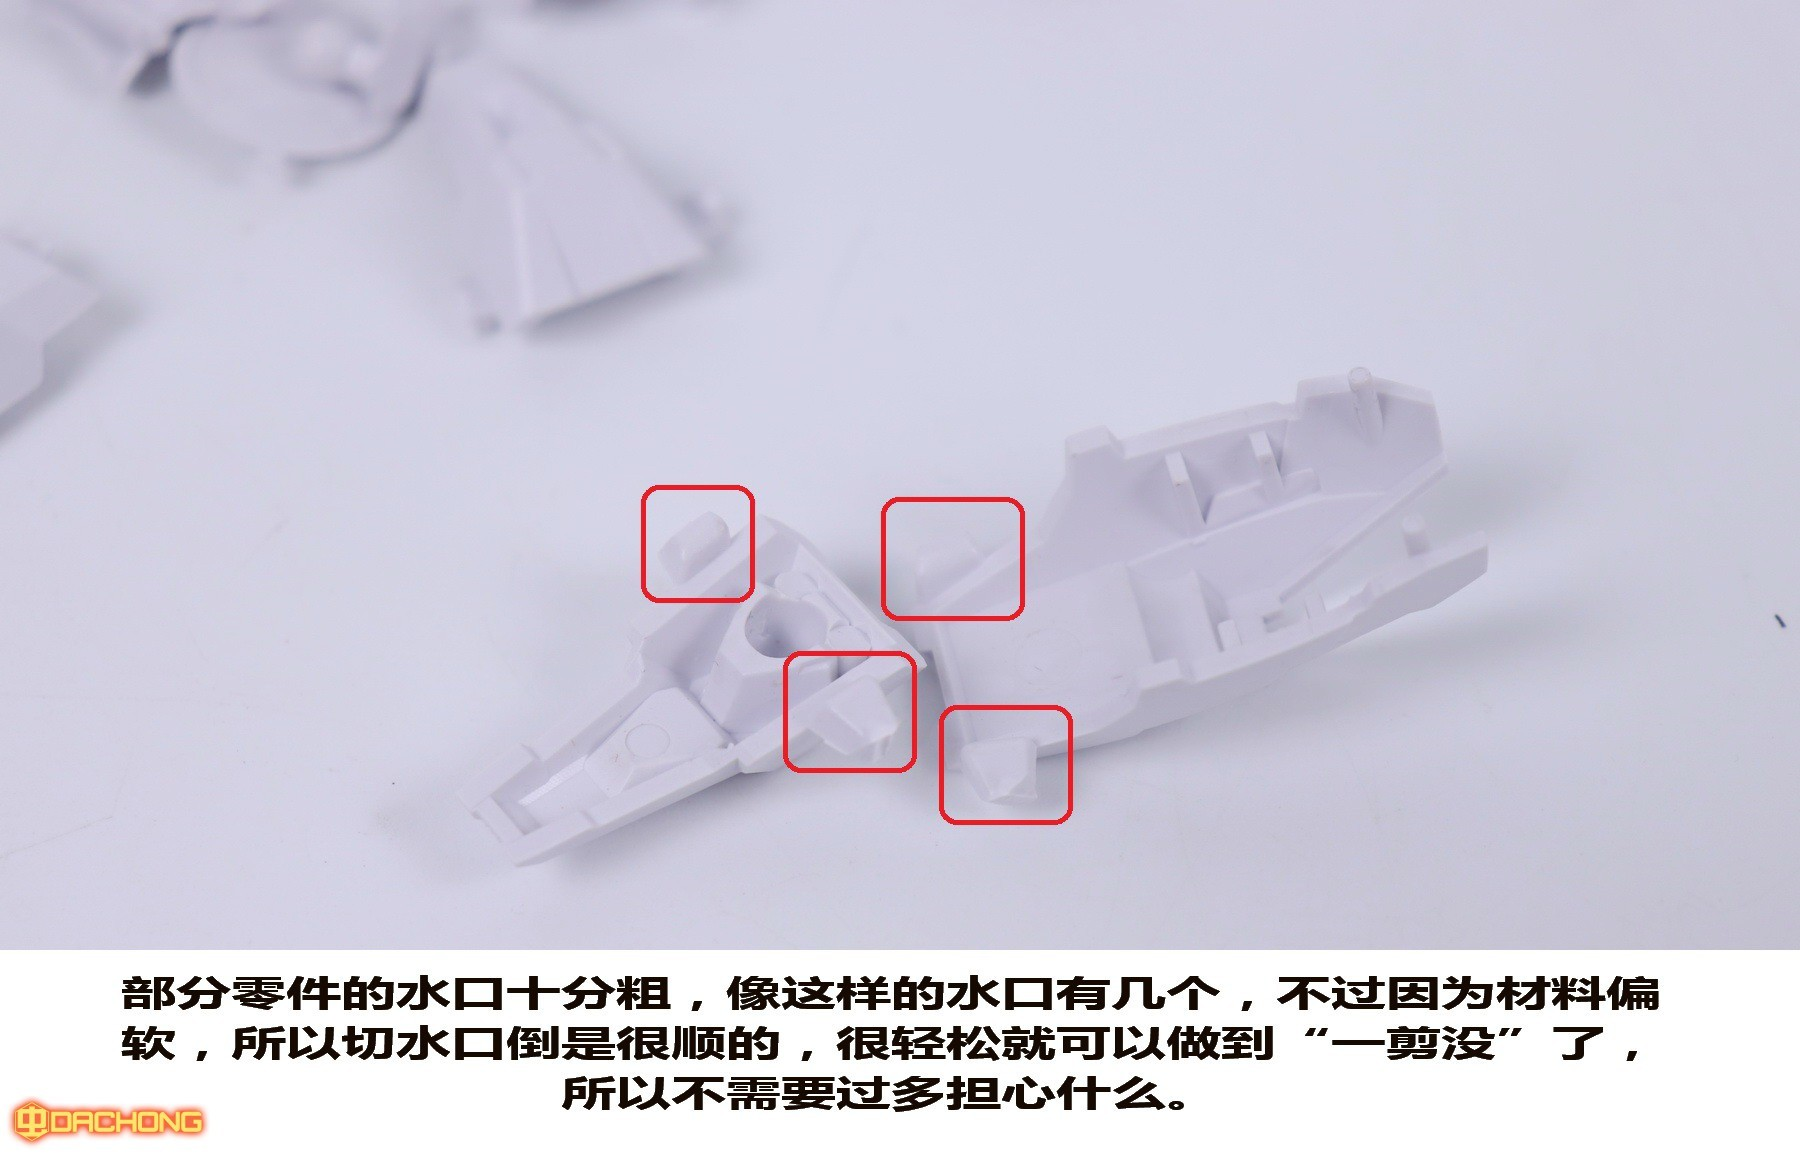 S420_NX_LSY_OOQ_066.jpg